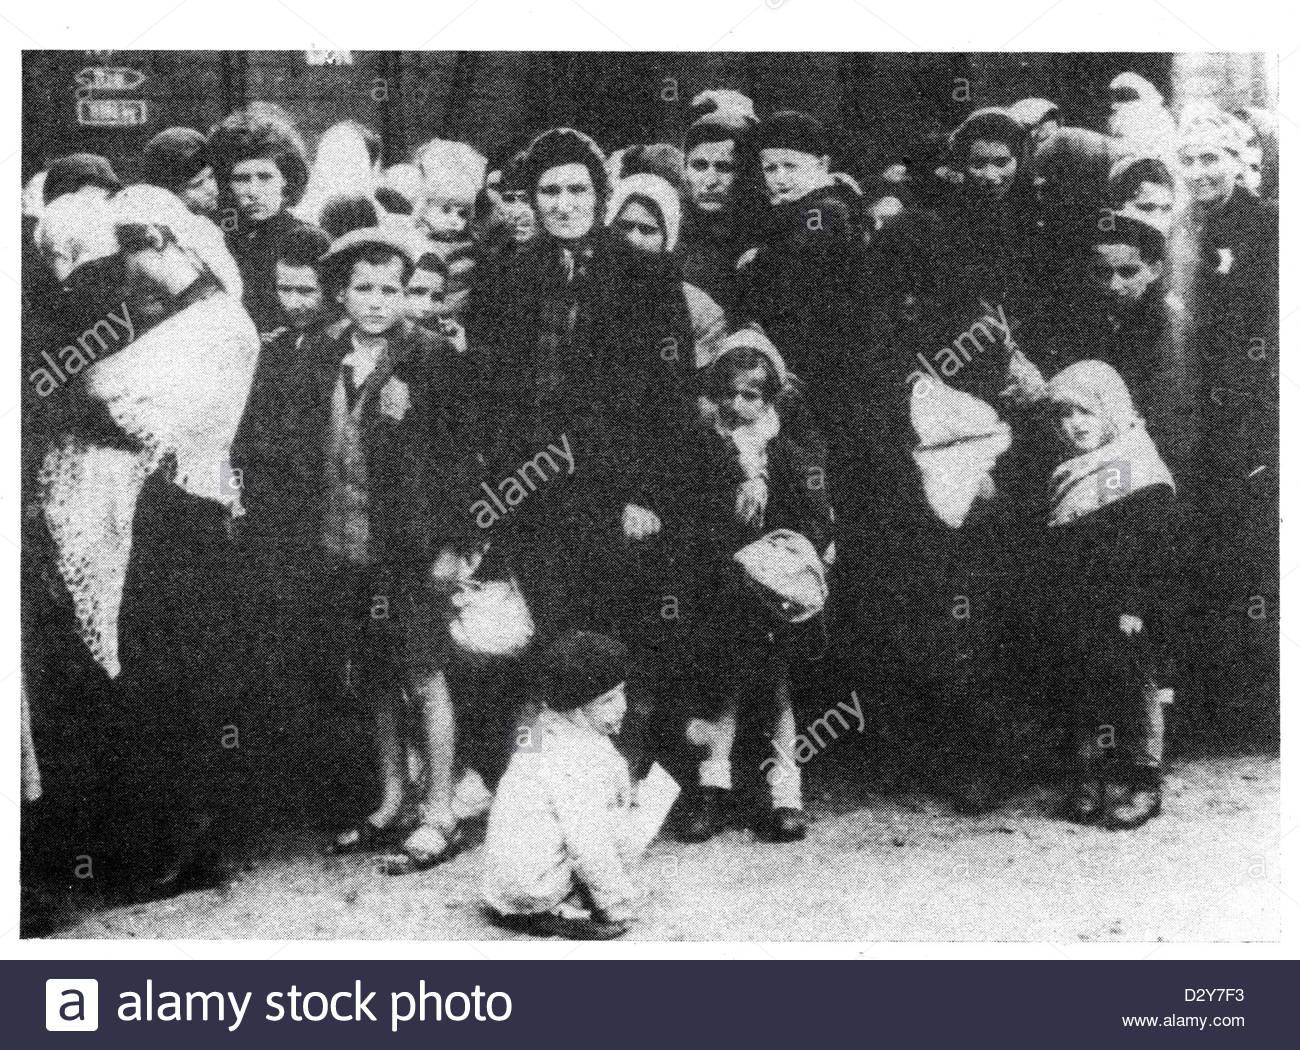 Rally Commemorates 1937 Memorial Day Massacre: Auschwitz Children Stock Photos & Auschwitz Children Stock